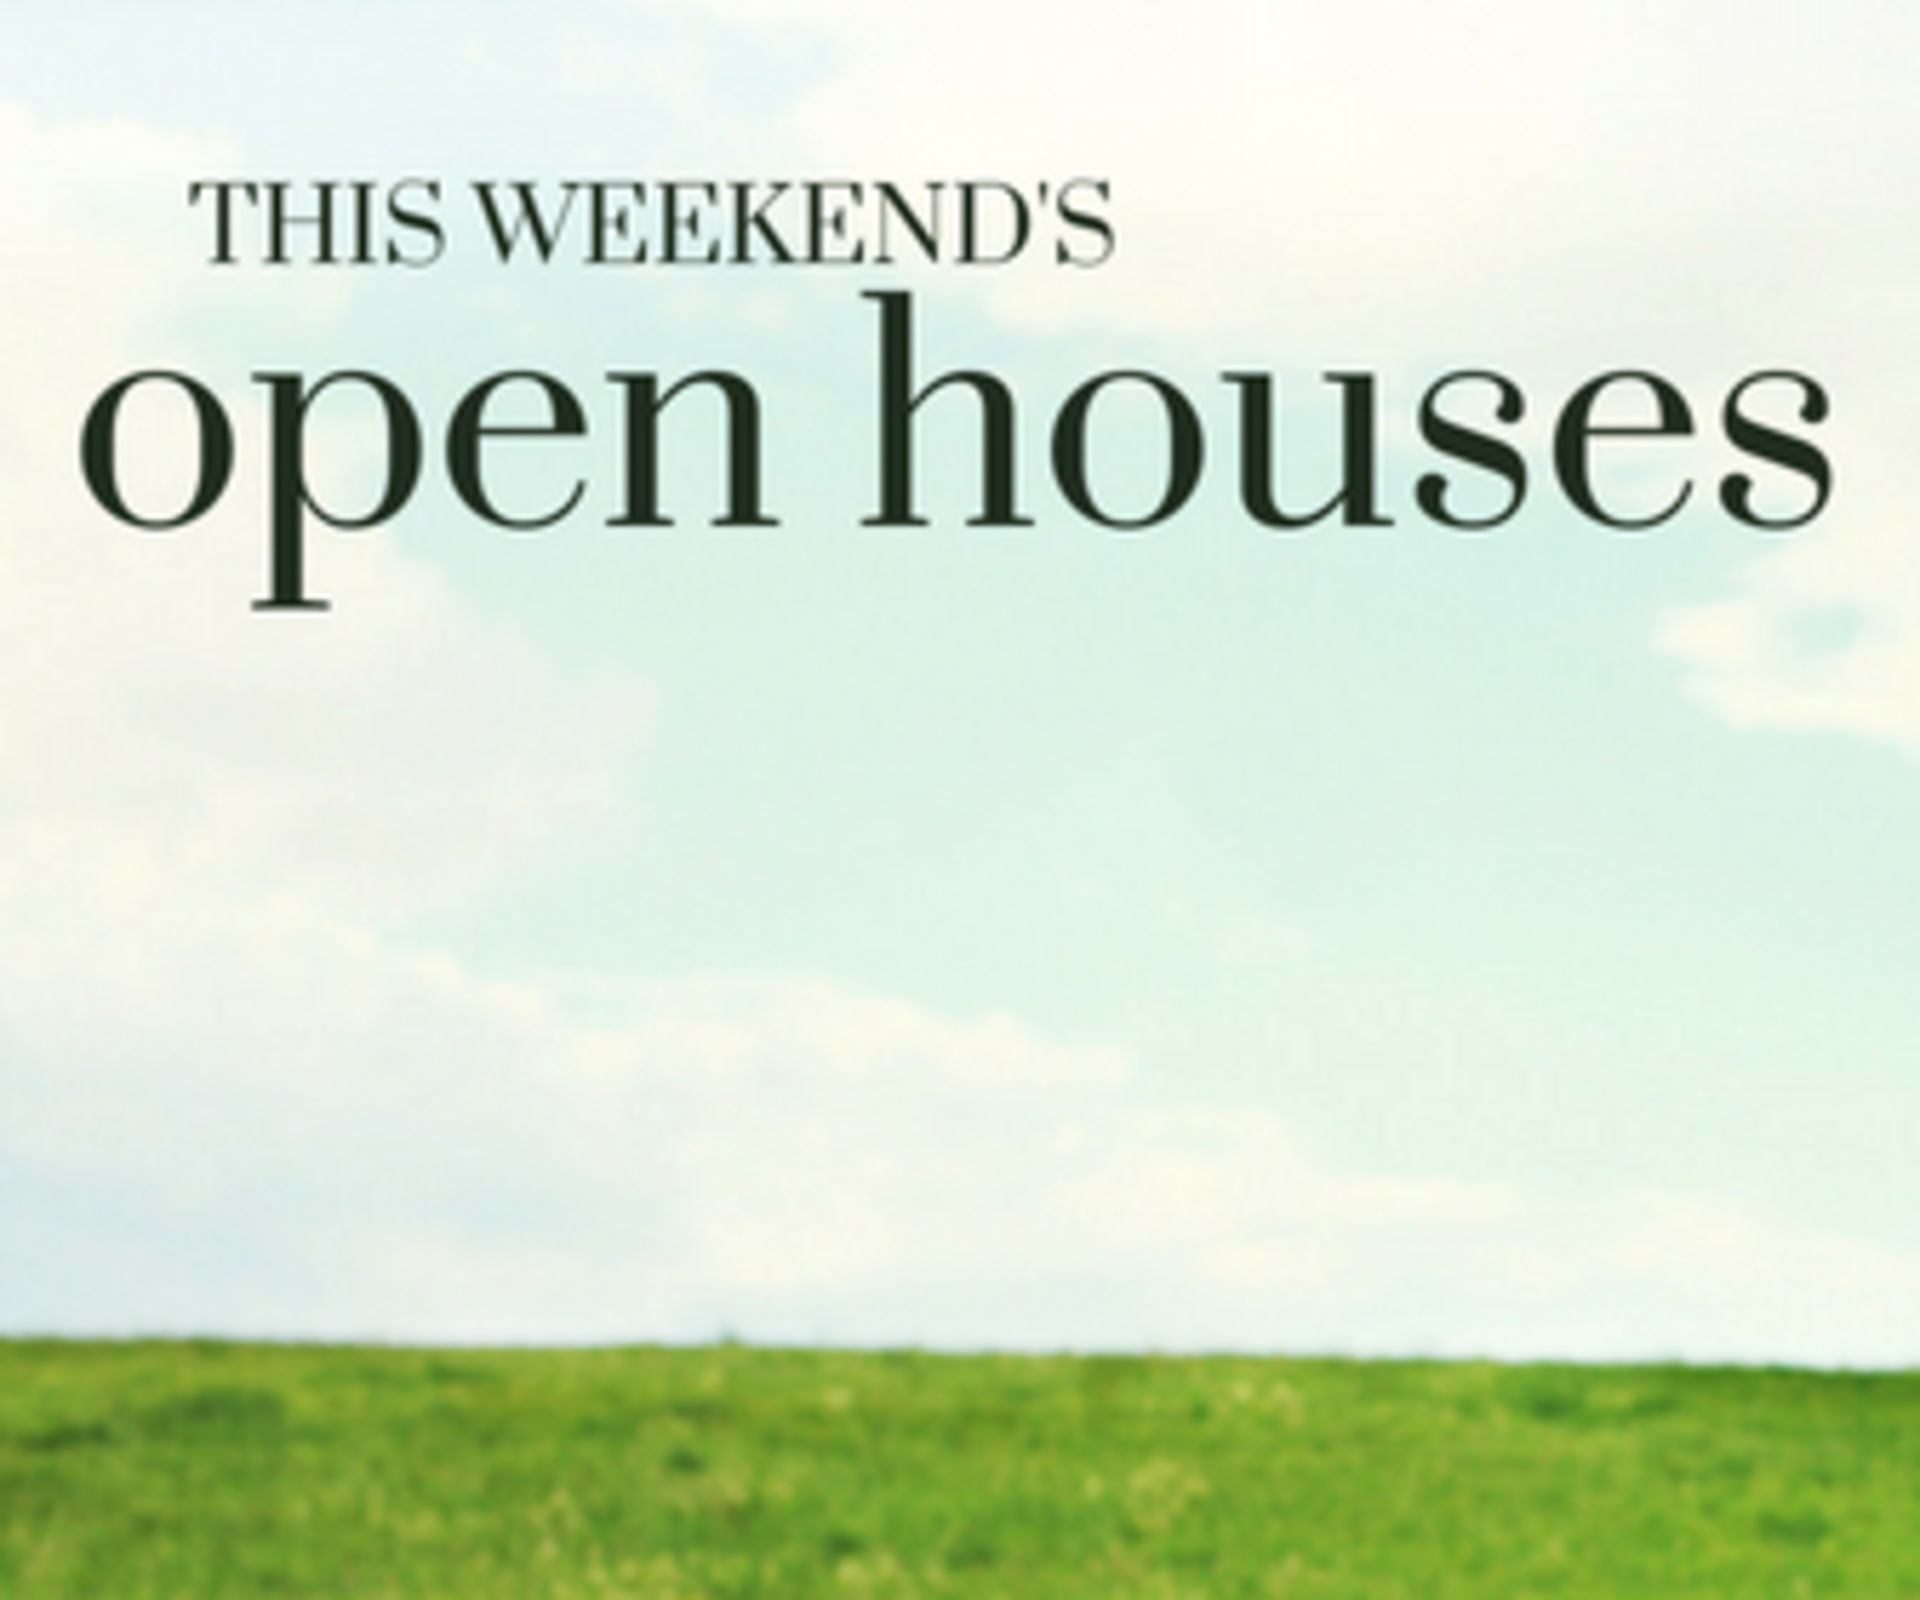 Weekend of 1/26 – 1/27 OPEN HOUSES!